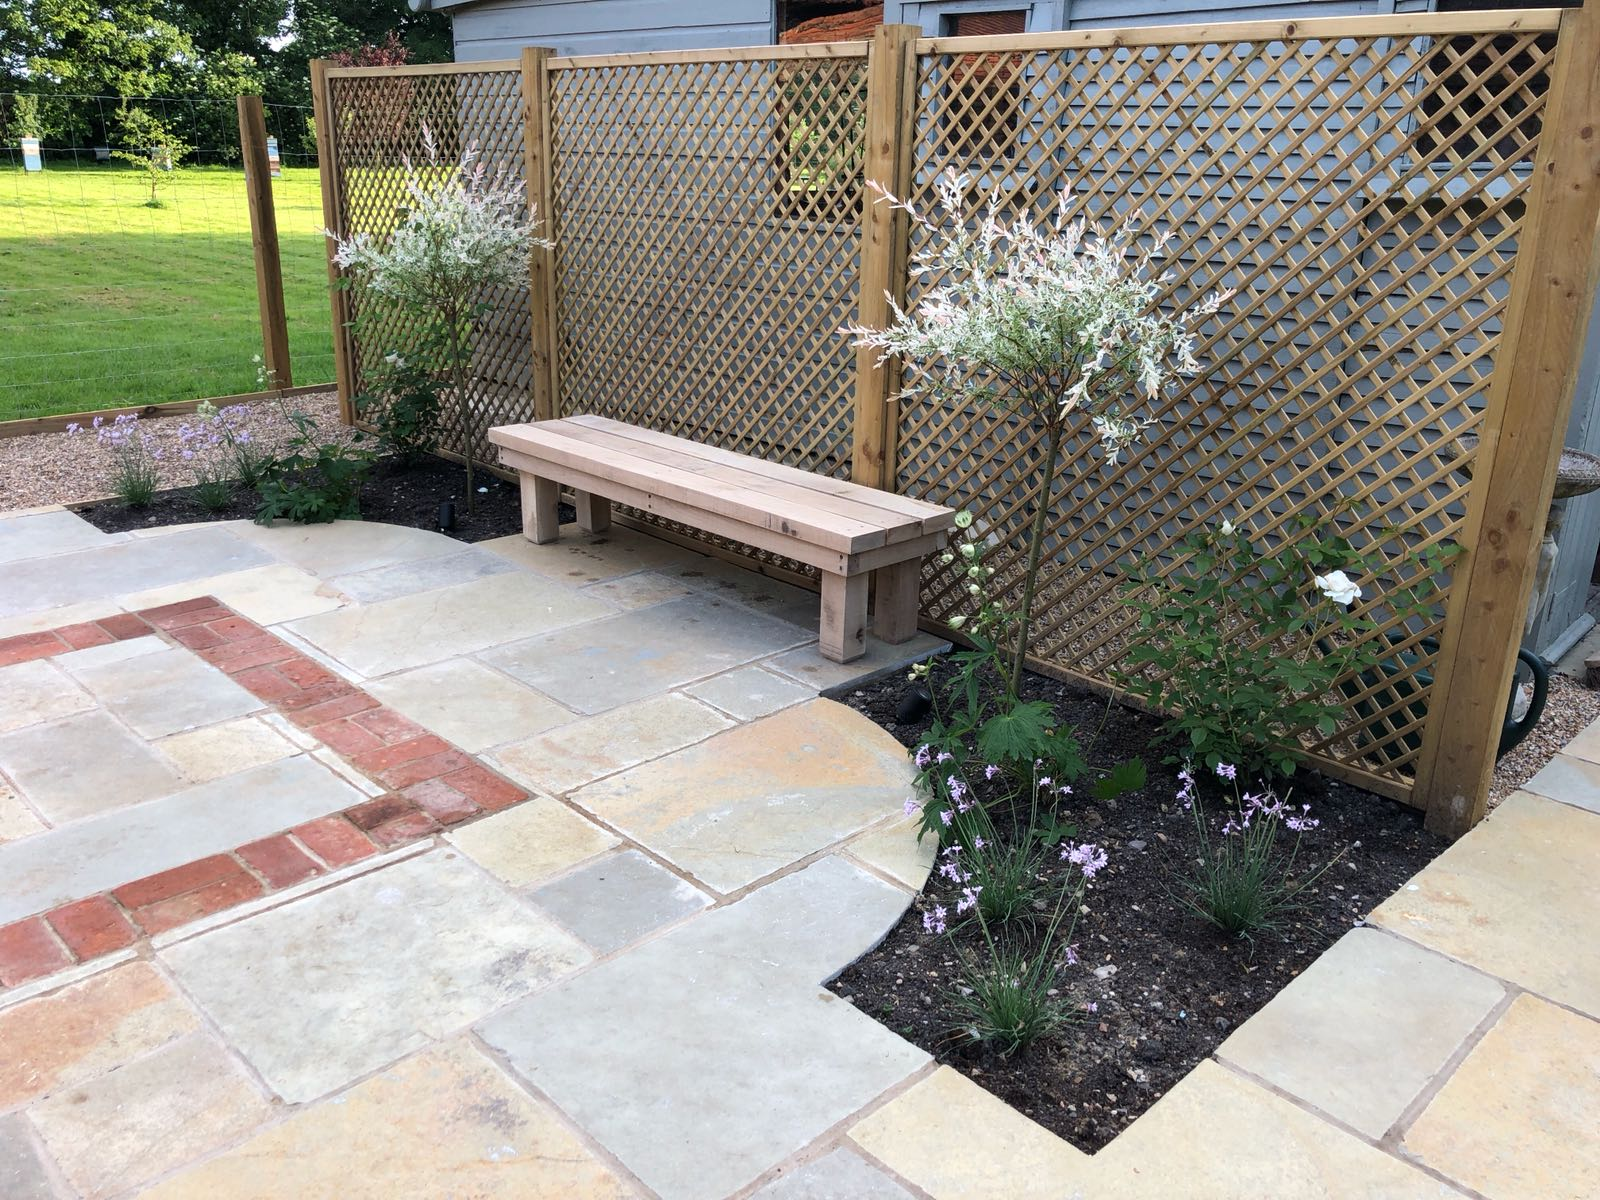 Oxford Garden Design | Jack Drewe Landscaping & Maintenance